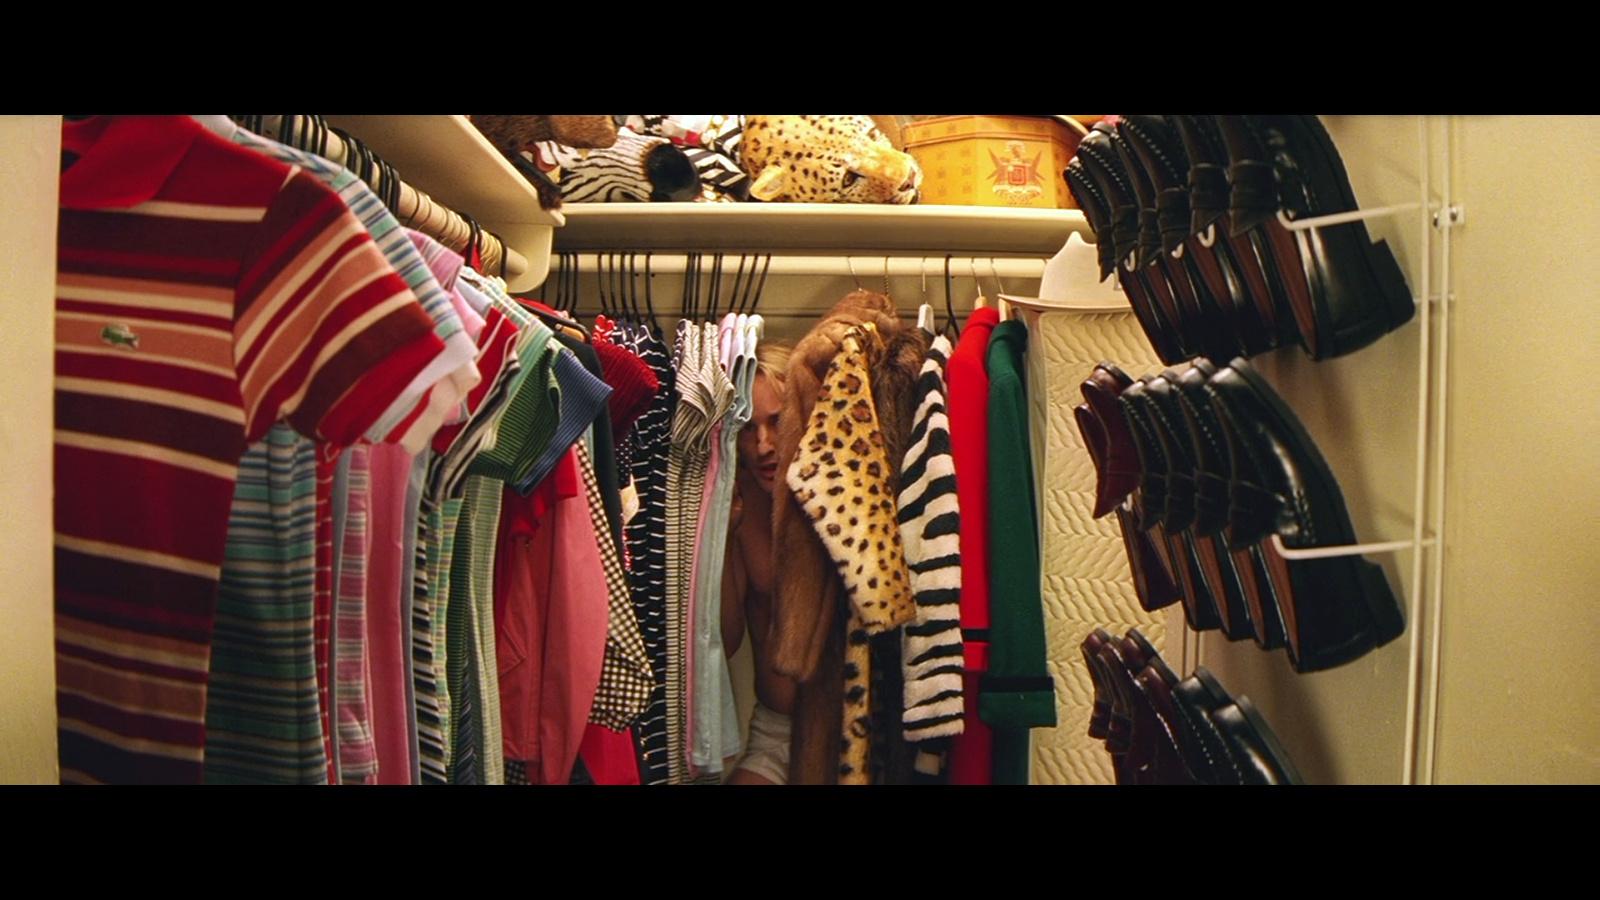 74617753dc03 It s your closet.  http   2.bp.blogspot.com -oMsw8sOAdDs UarWnkUL0MI AAAAAAAAAIQ 8Vlpq8B9C18 s1600 Fullscreen+capture+622013+11316+AM.bmp.jpg